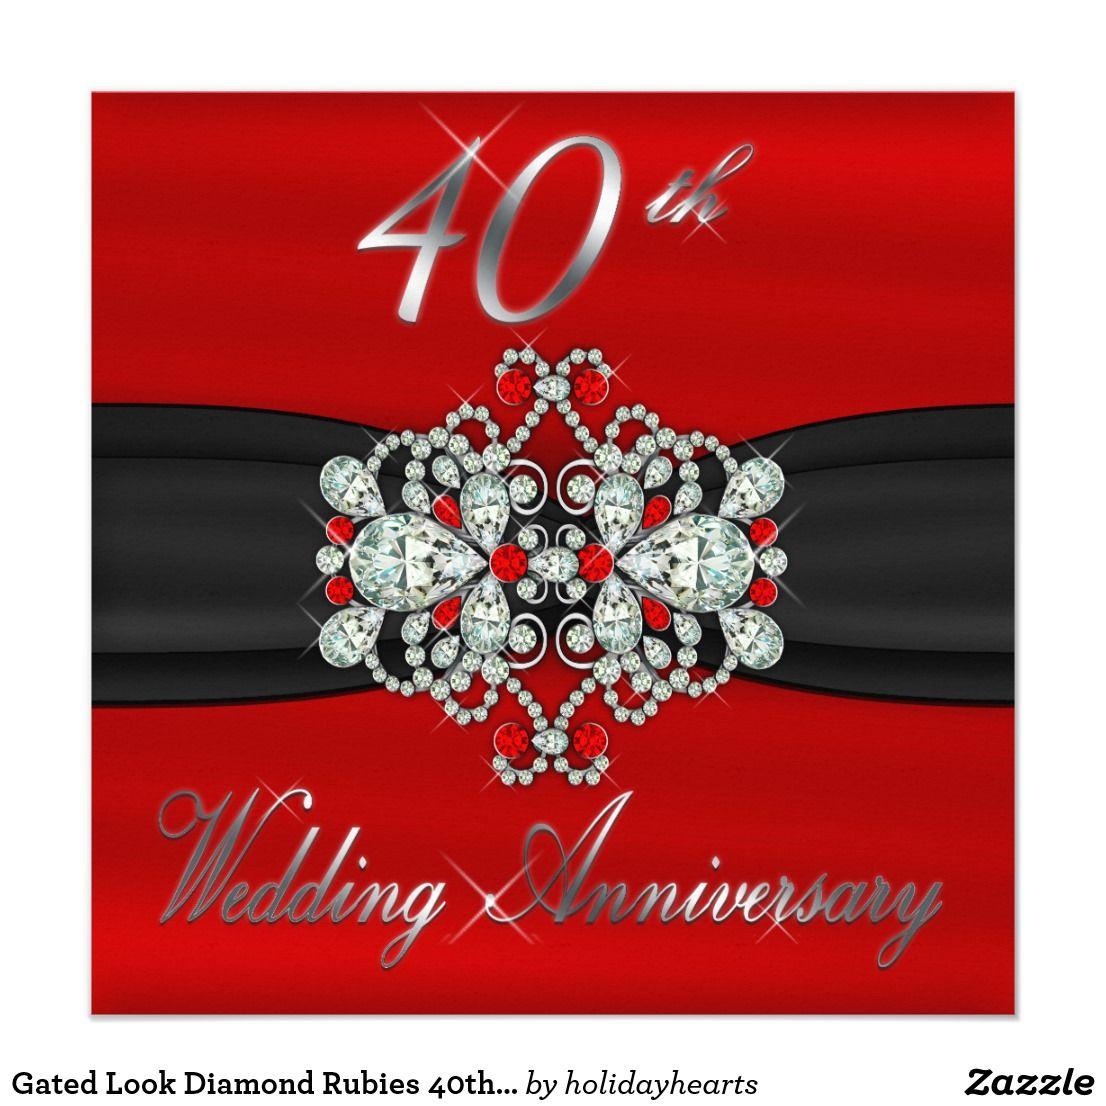 Gated Look Diamond Rubies 40th Wedding Anniversary Card | 40th ...